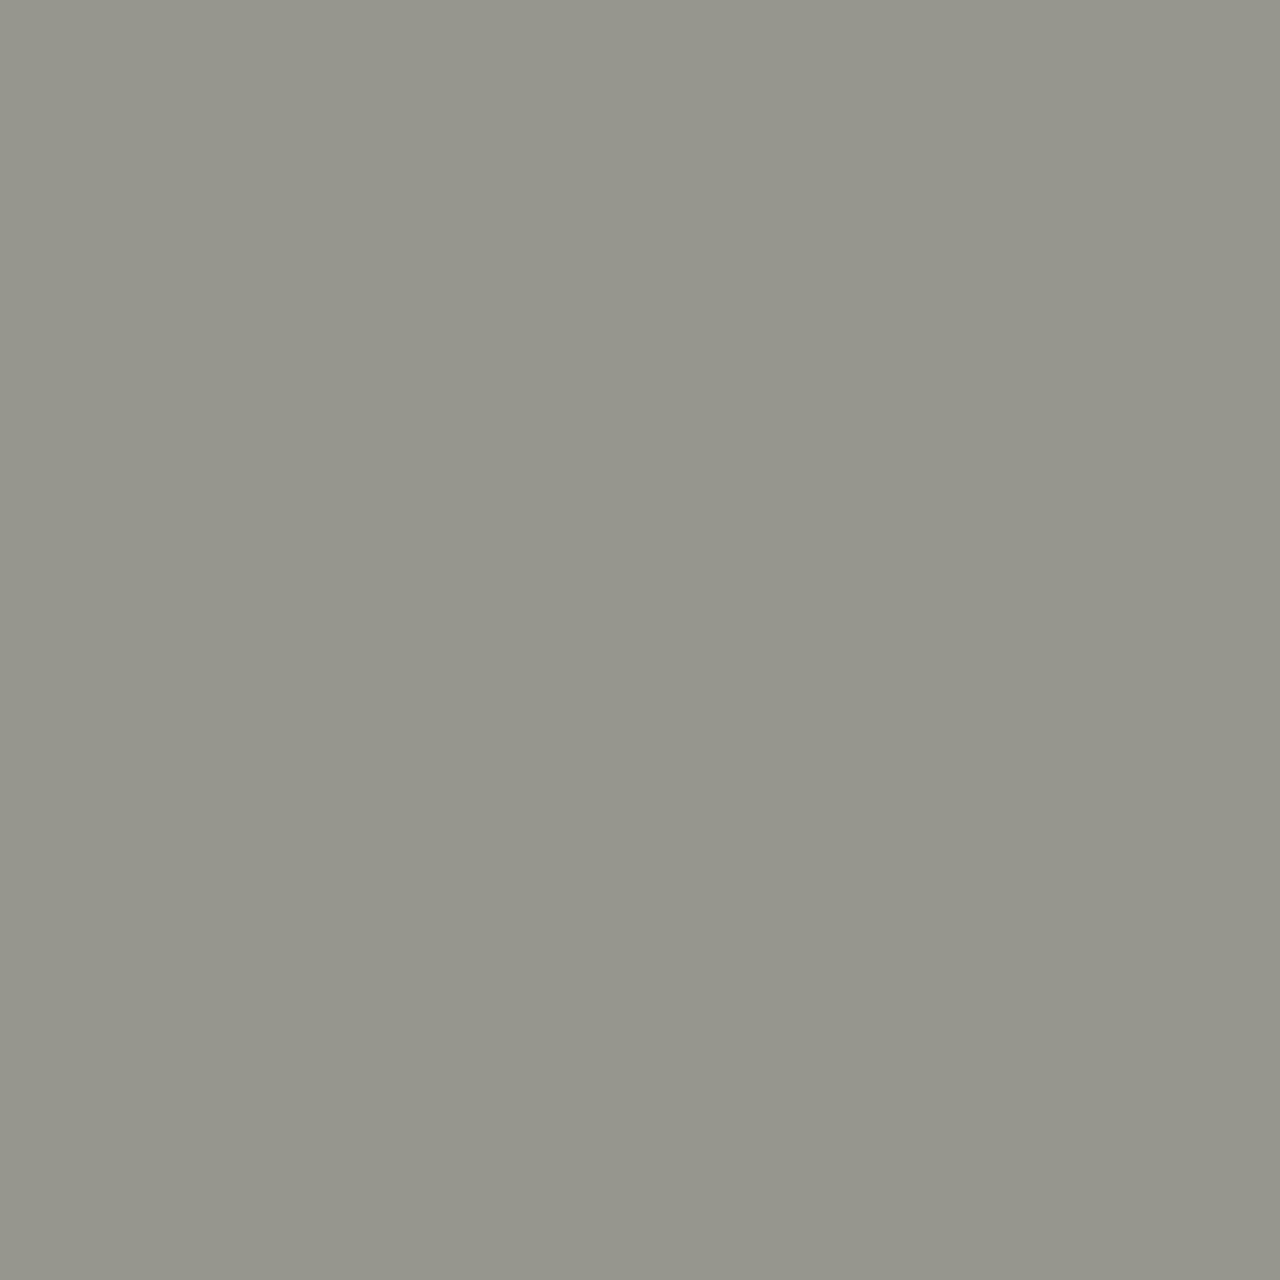 Middle Grey Oracal 631 Matte Vinyl Rolls